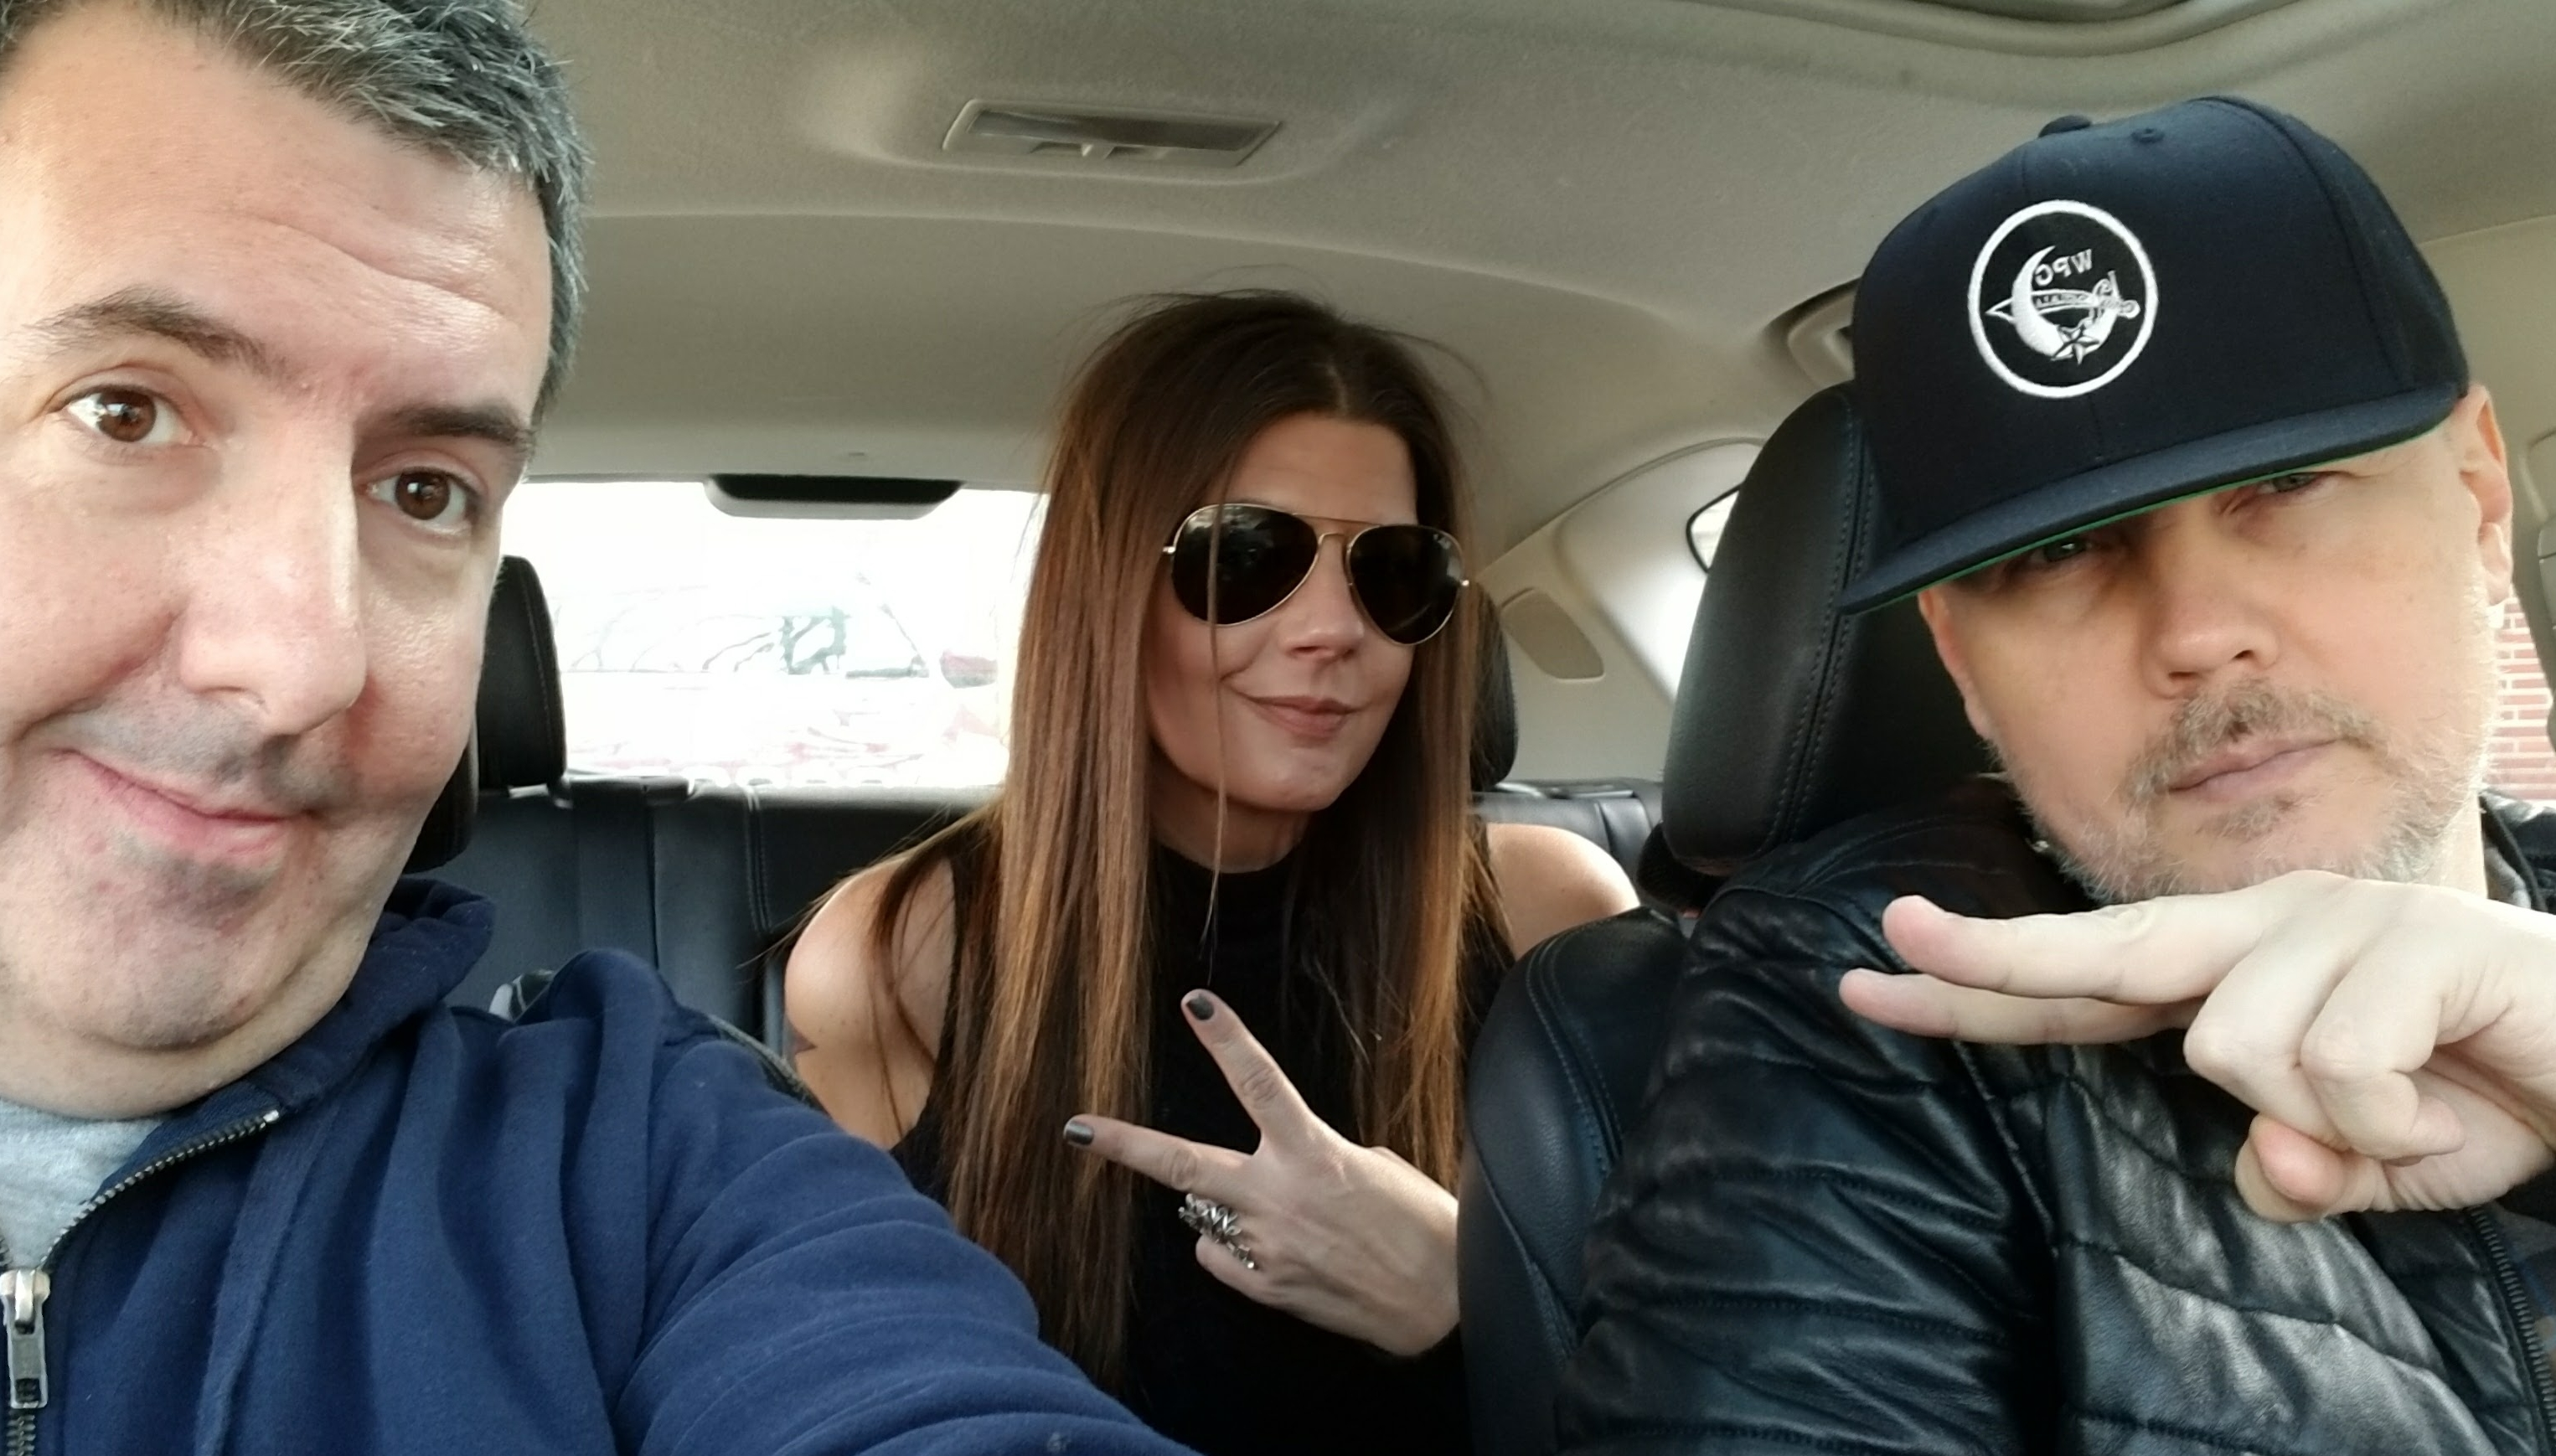 Car Con Corgan – Billy Corgan (Smashing Pumpkins) and Sheri Shaw at Madame Zuzu's (CCC)